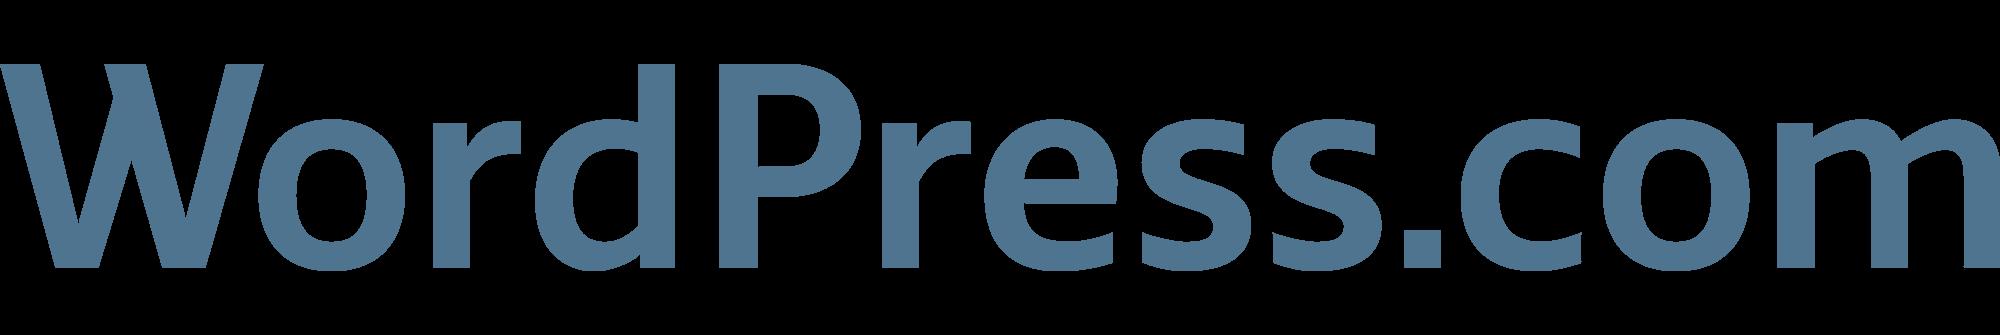 wordpresscomlogo1